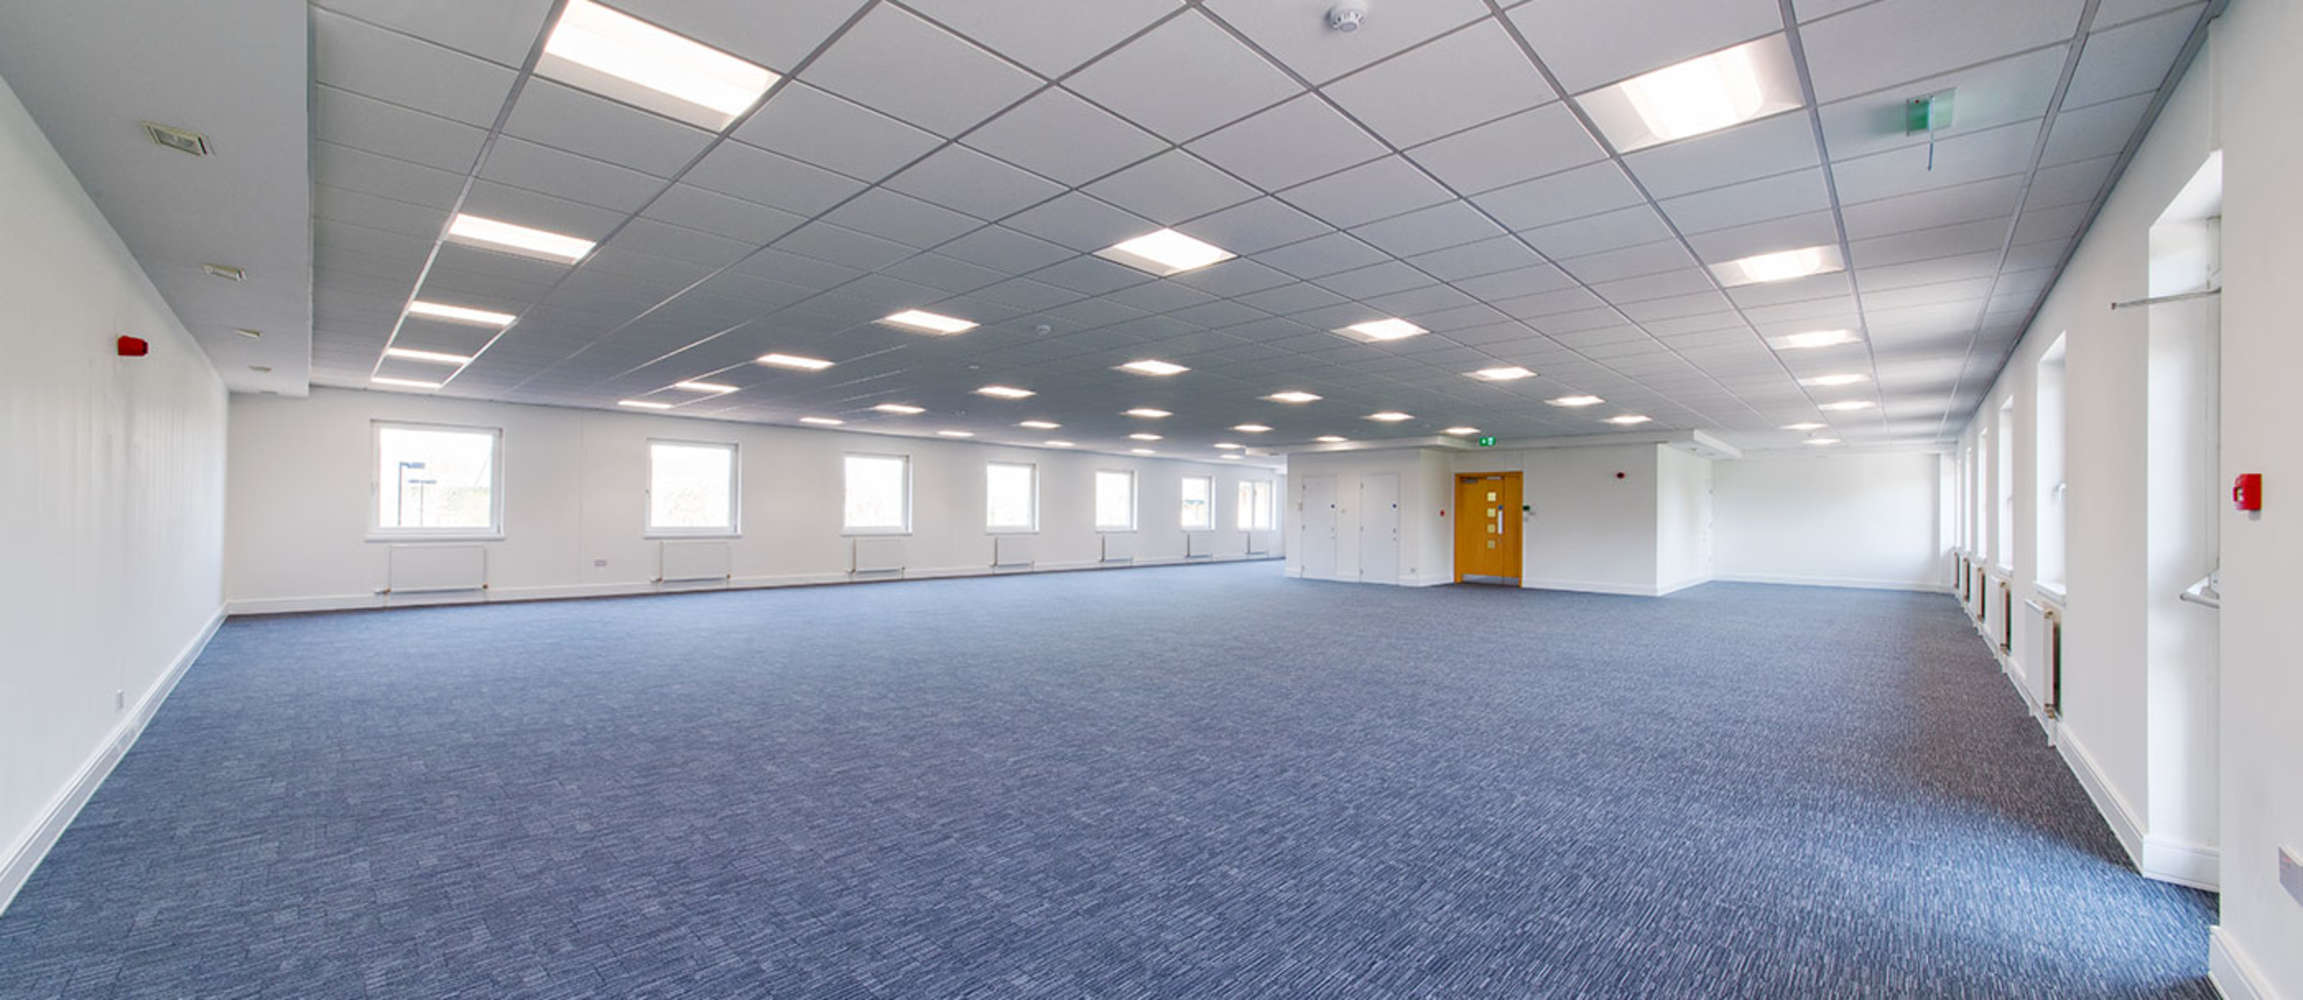 Office Birmingham, B37 7YE - 2665 Kings Court, Birmingham Business Park - 2